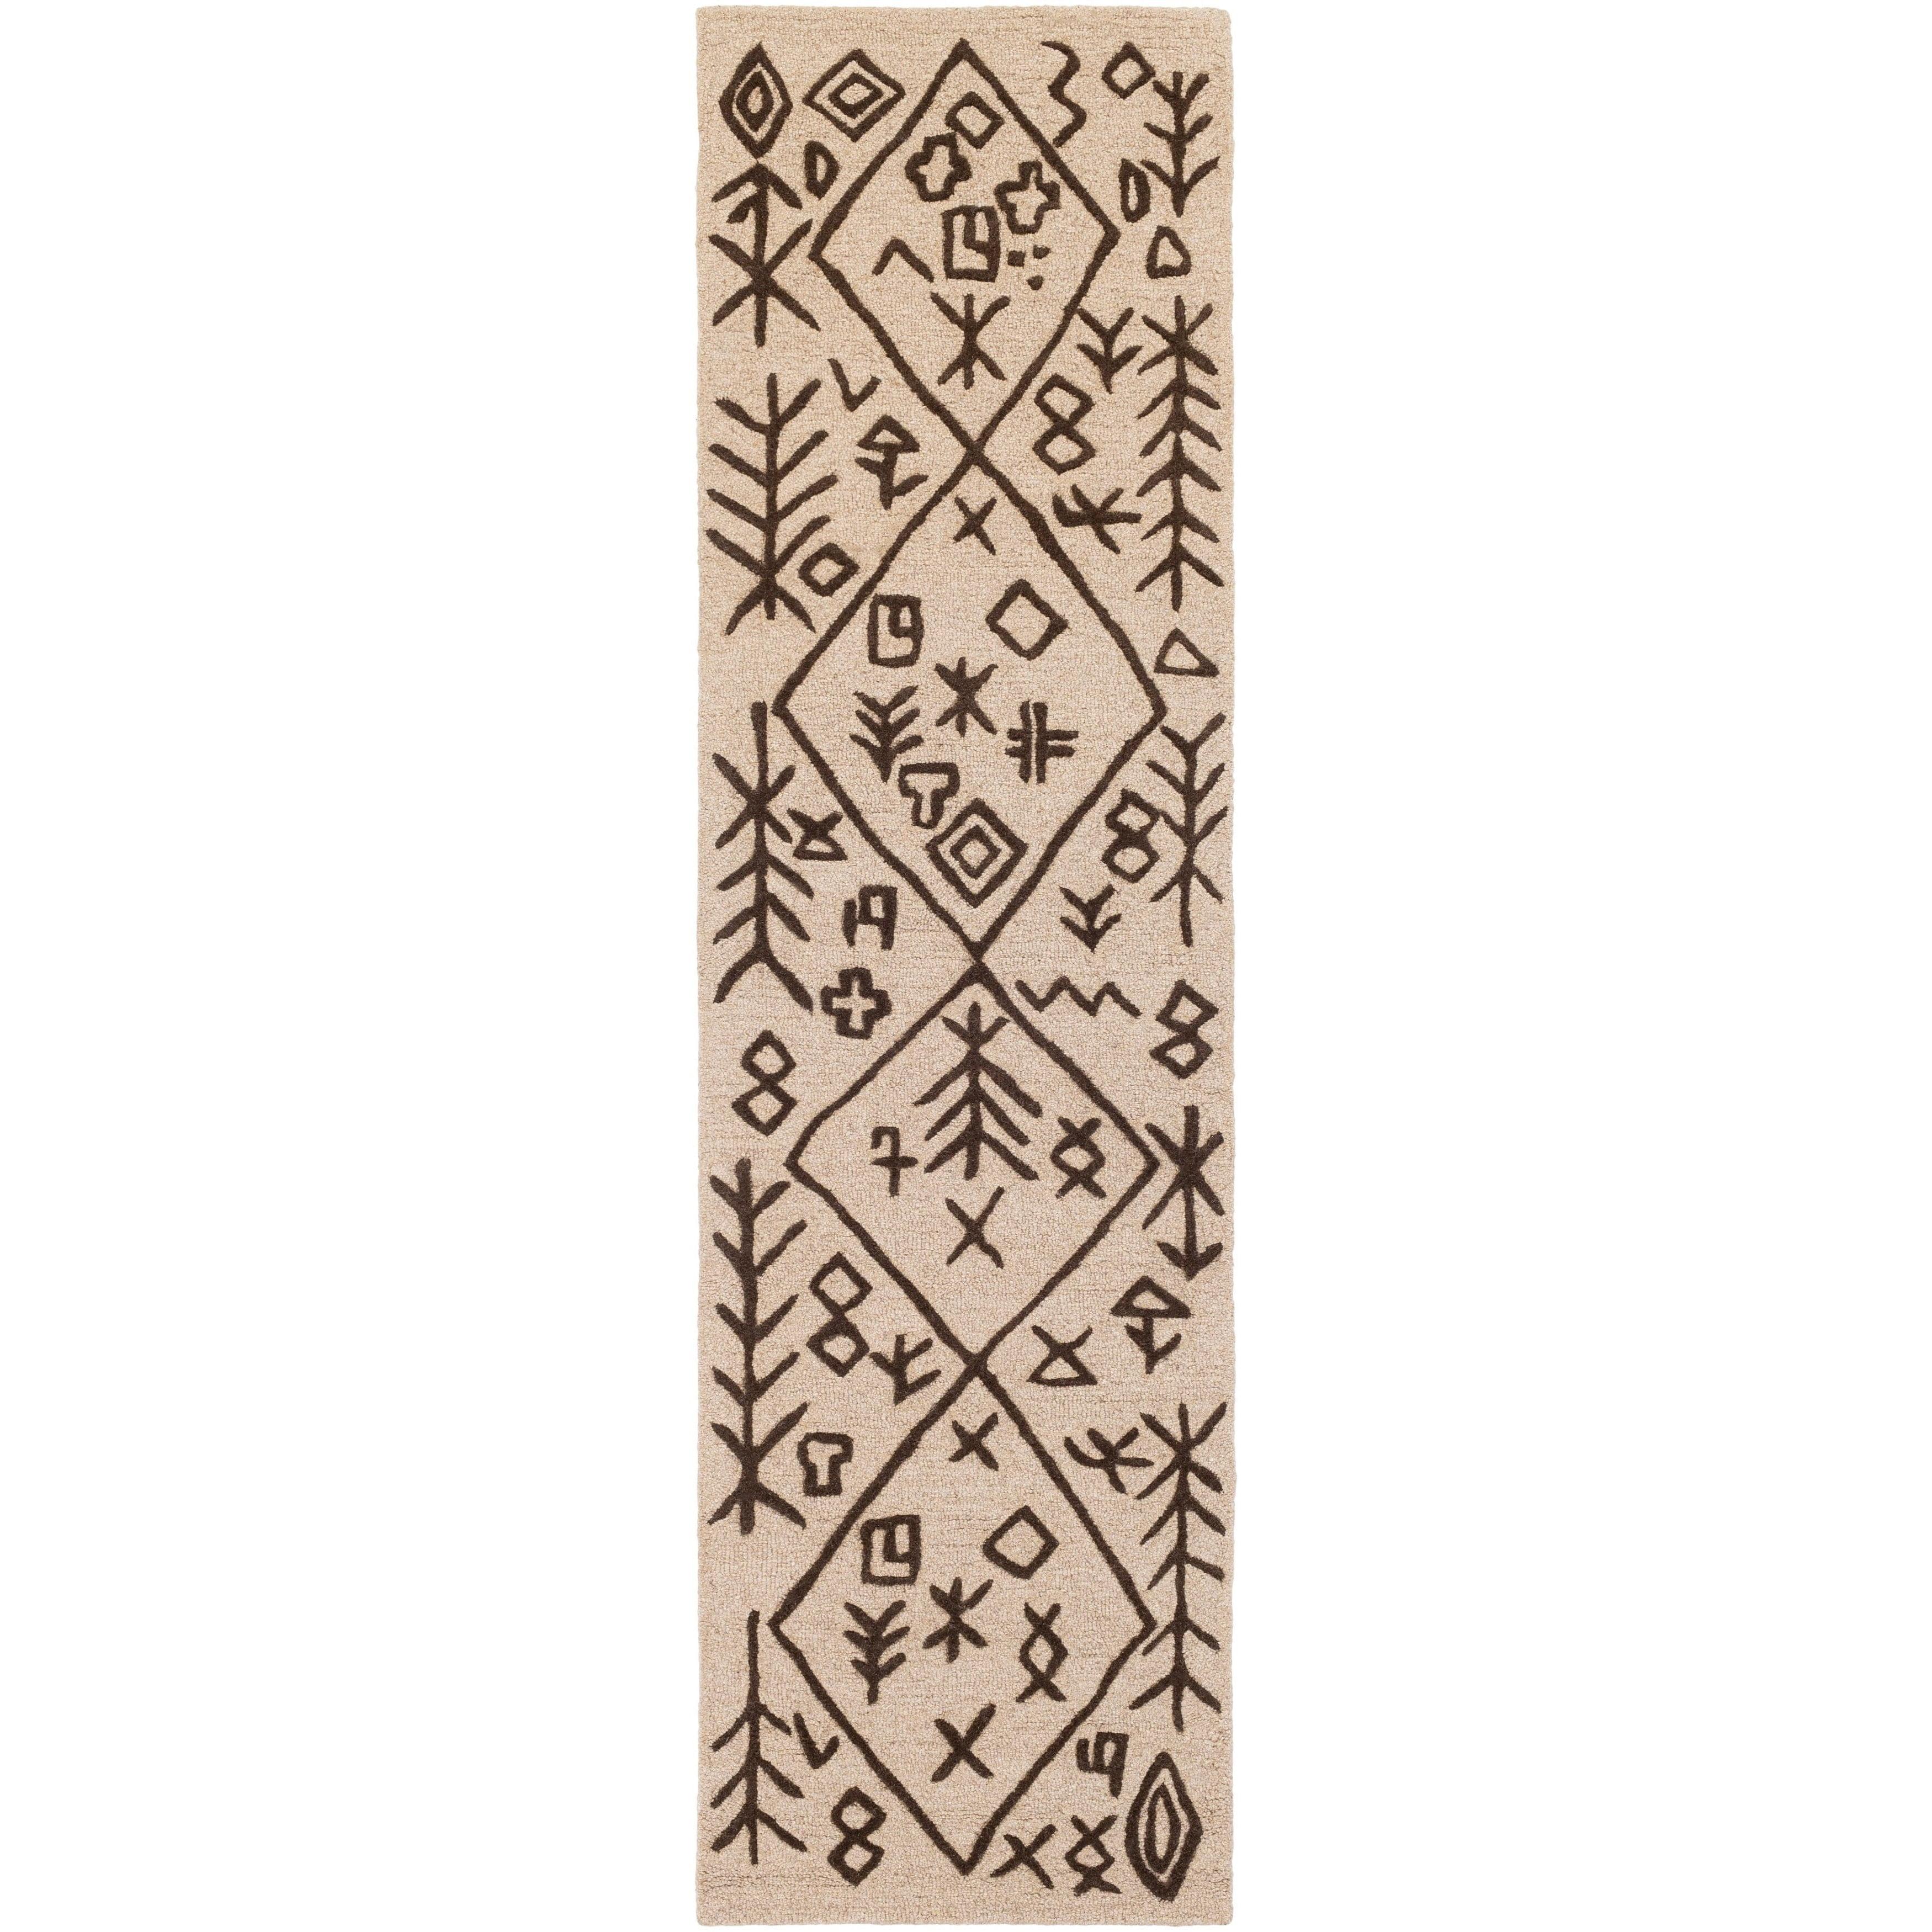 Surya Carpet, Inc. Hand-Tufted Track Wool Rug (2' x 8')